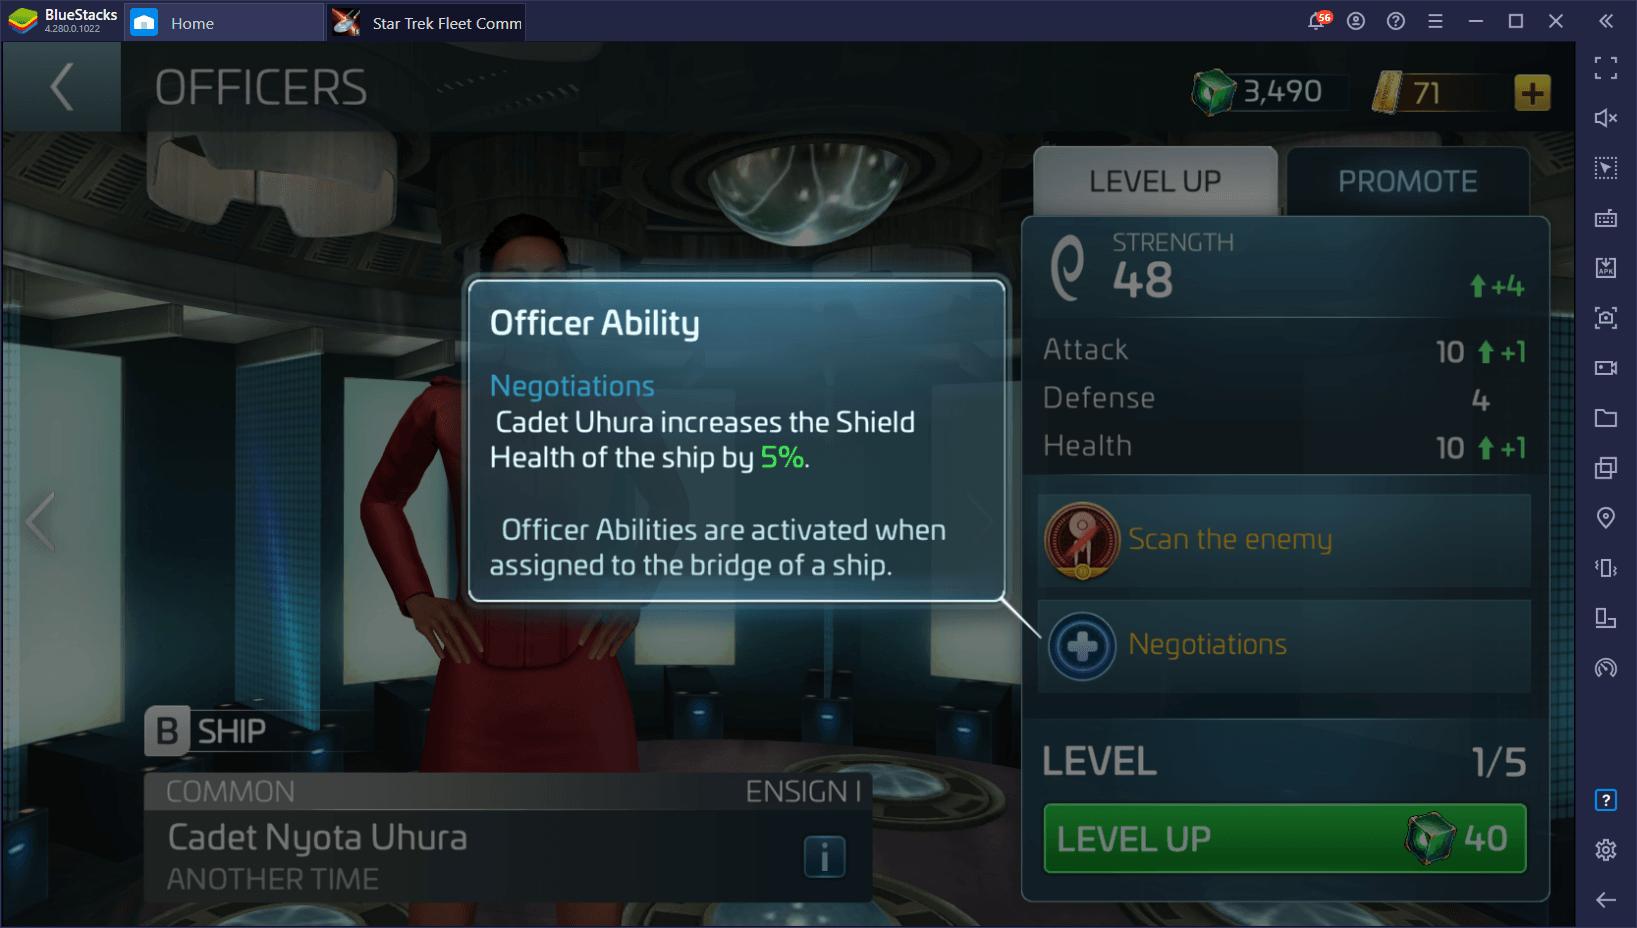 Star Trek Fleet Command – Comprehensive Guide for the Officer System